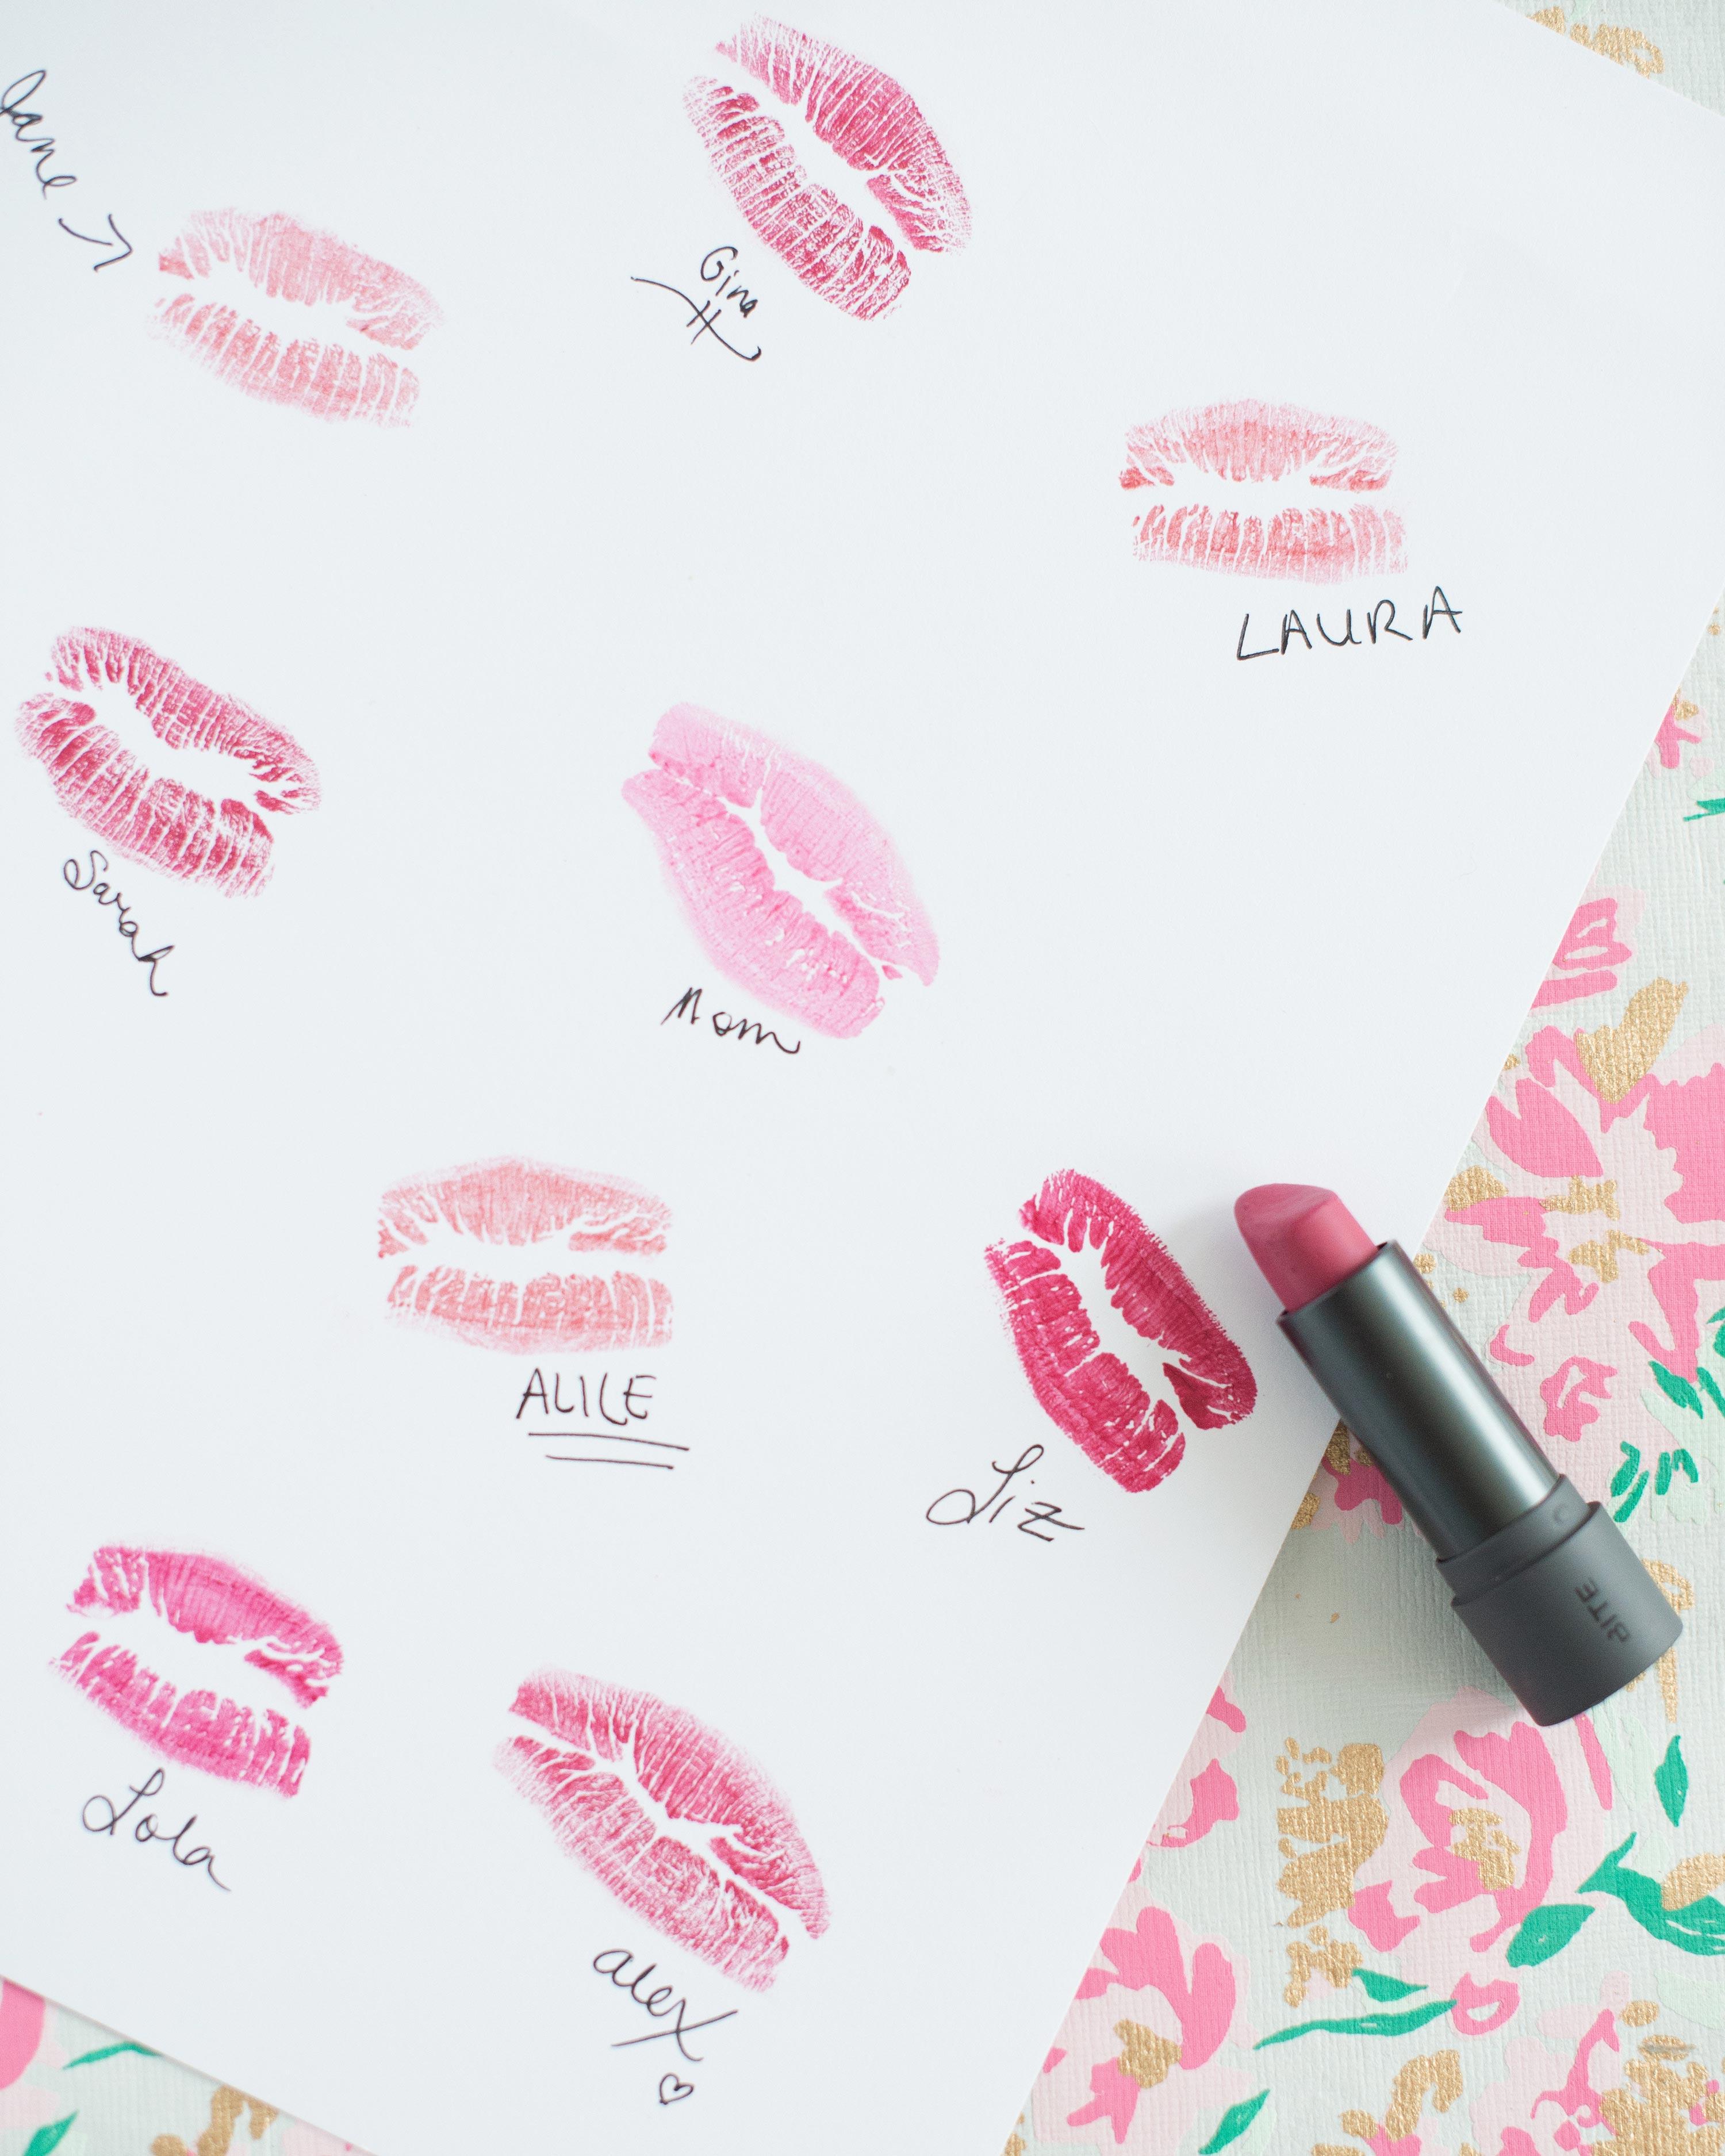 adrienne-bridal-shower-kisses-lipstick-20-6134175-0716.jpg